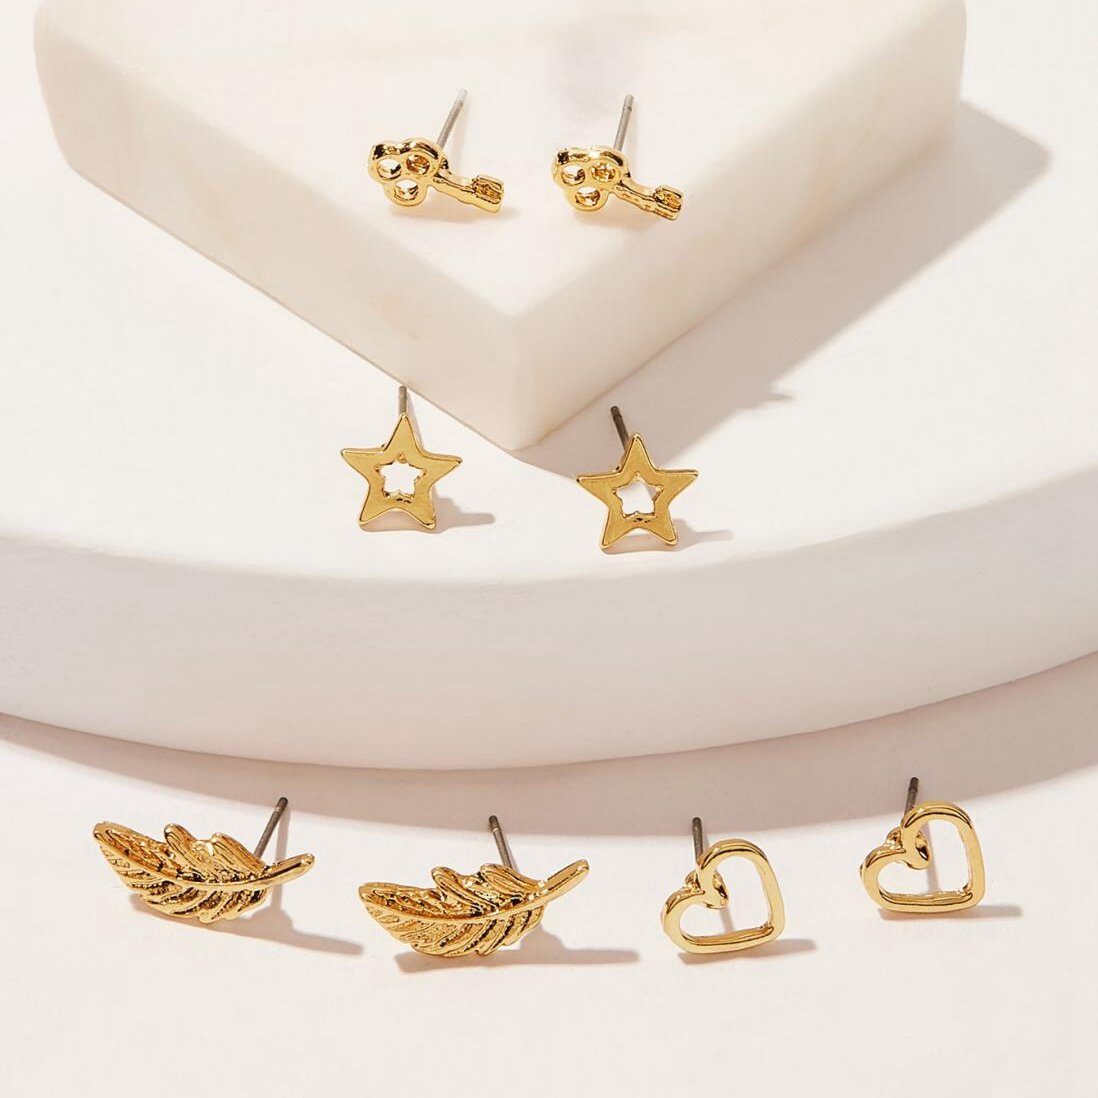 Trendy 4 Pcs Hollow Earring Stud Set Star Peach Heart Leaves Metal Geometric Earrings